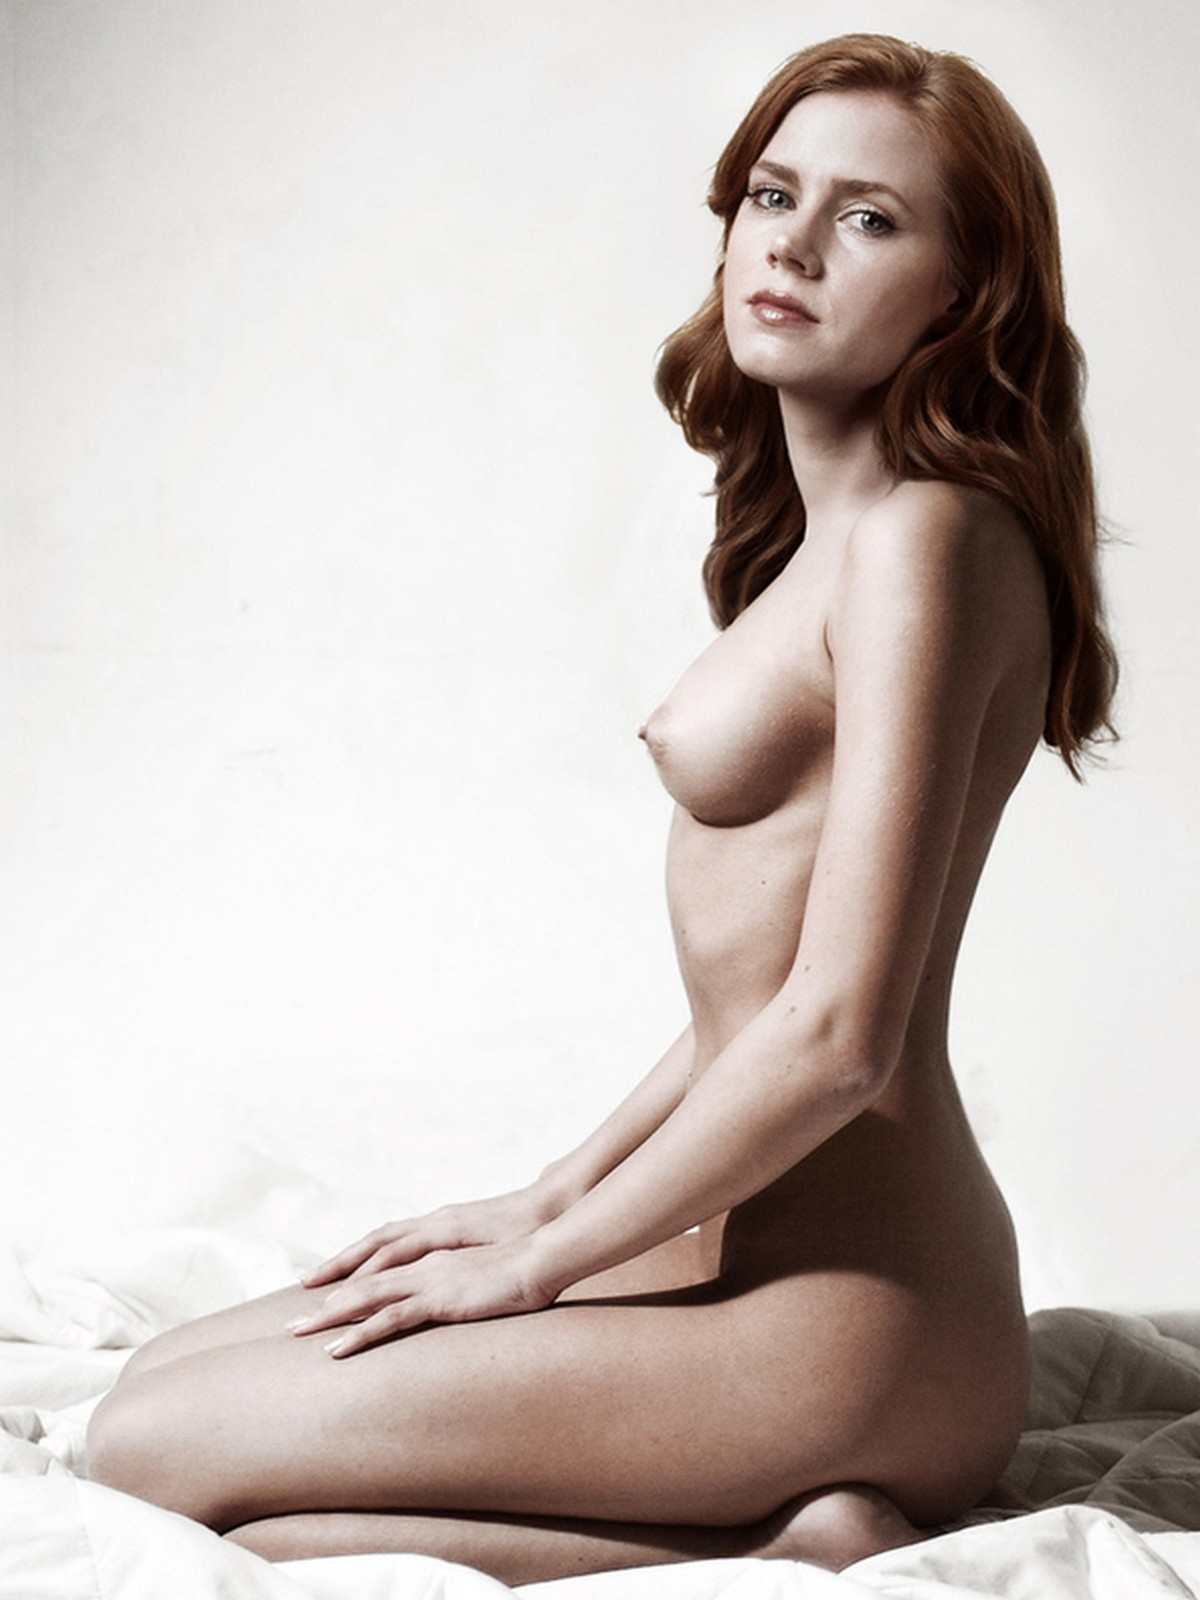 Adam amy nude picture